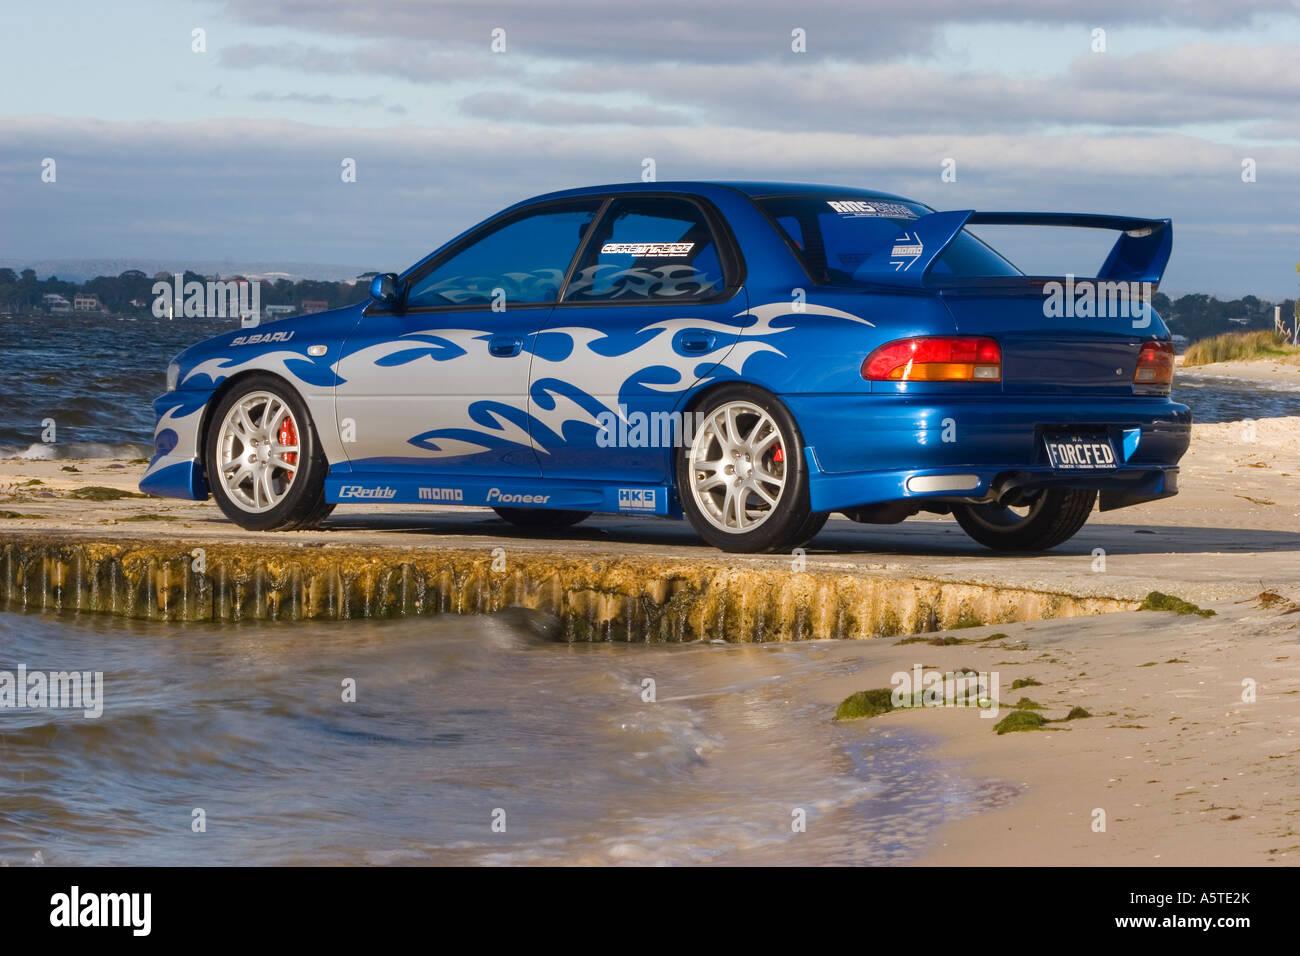 Modified Performance Subaru Wrx Japanese Sports Car Sitting On A